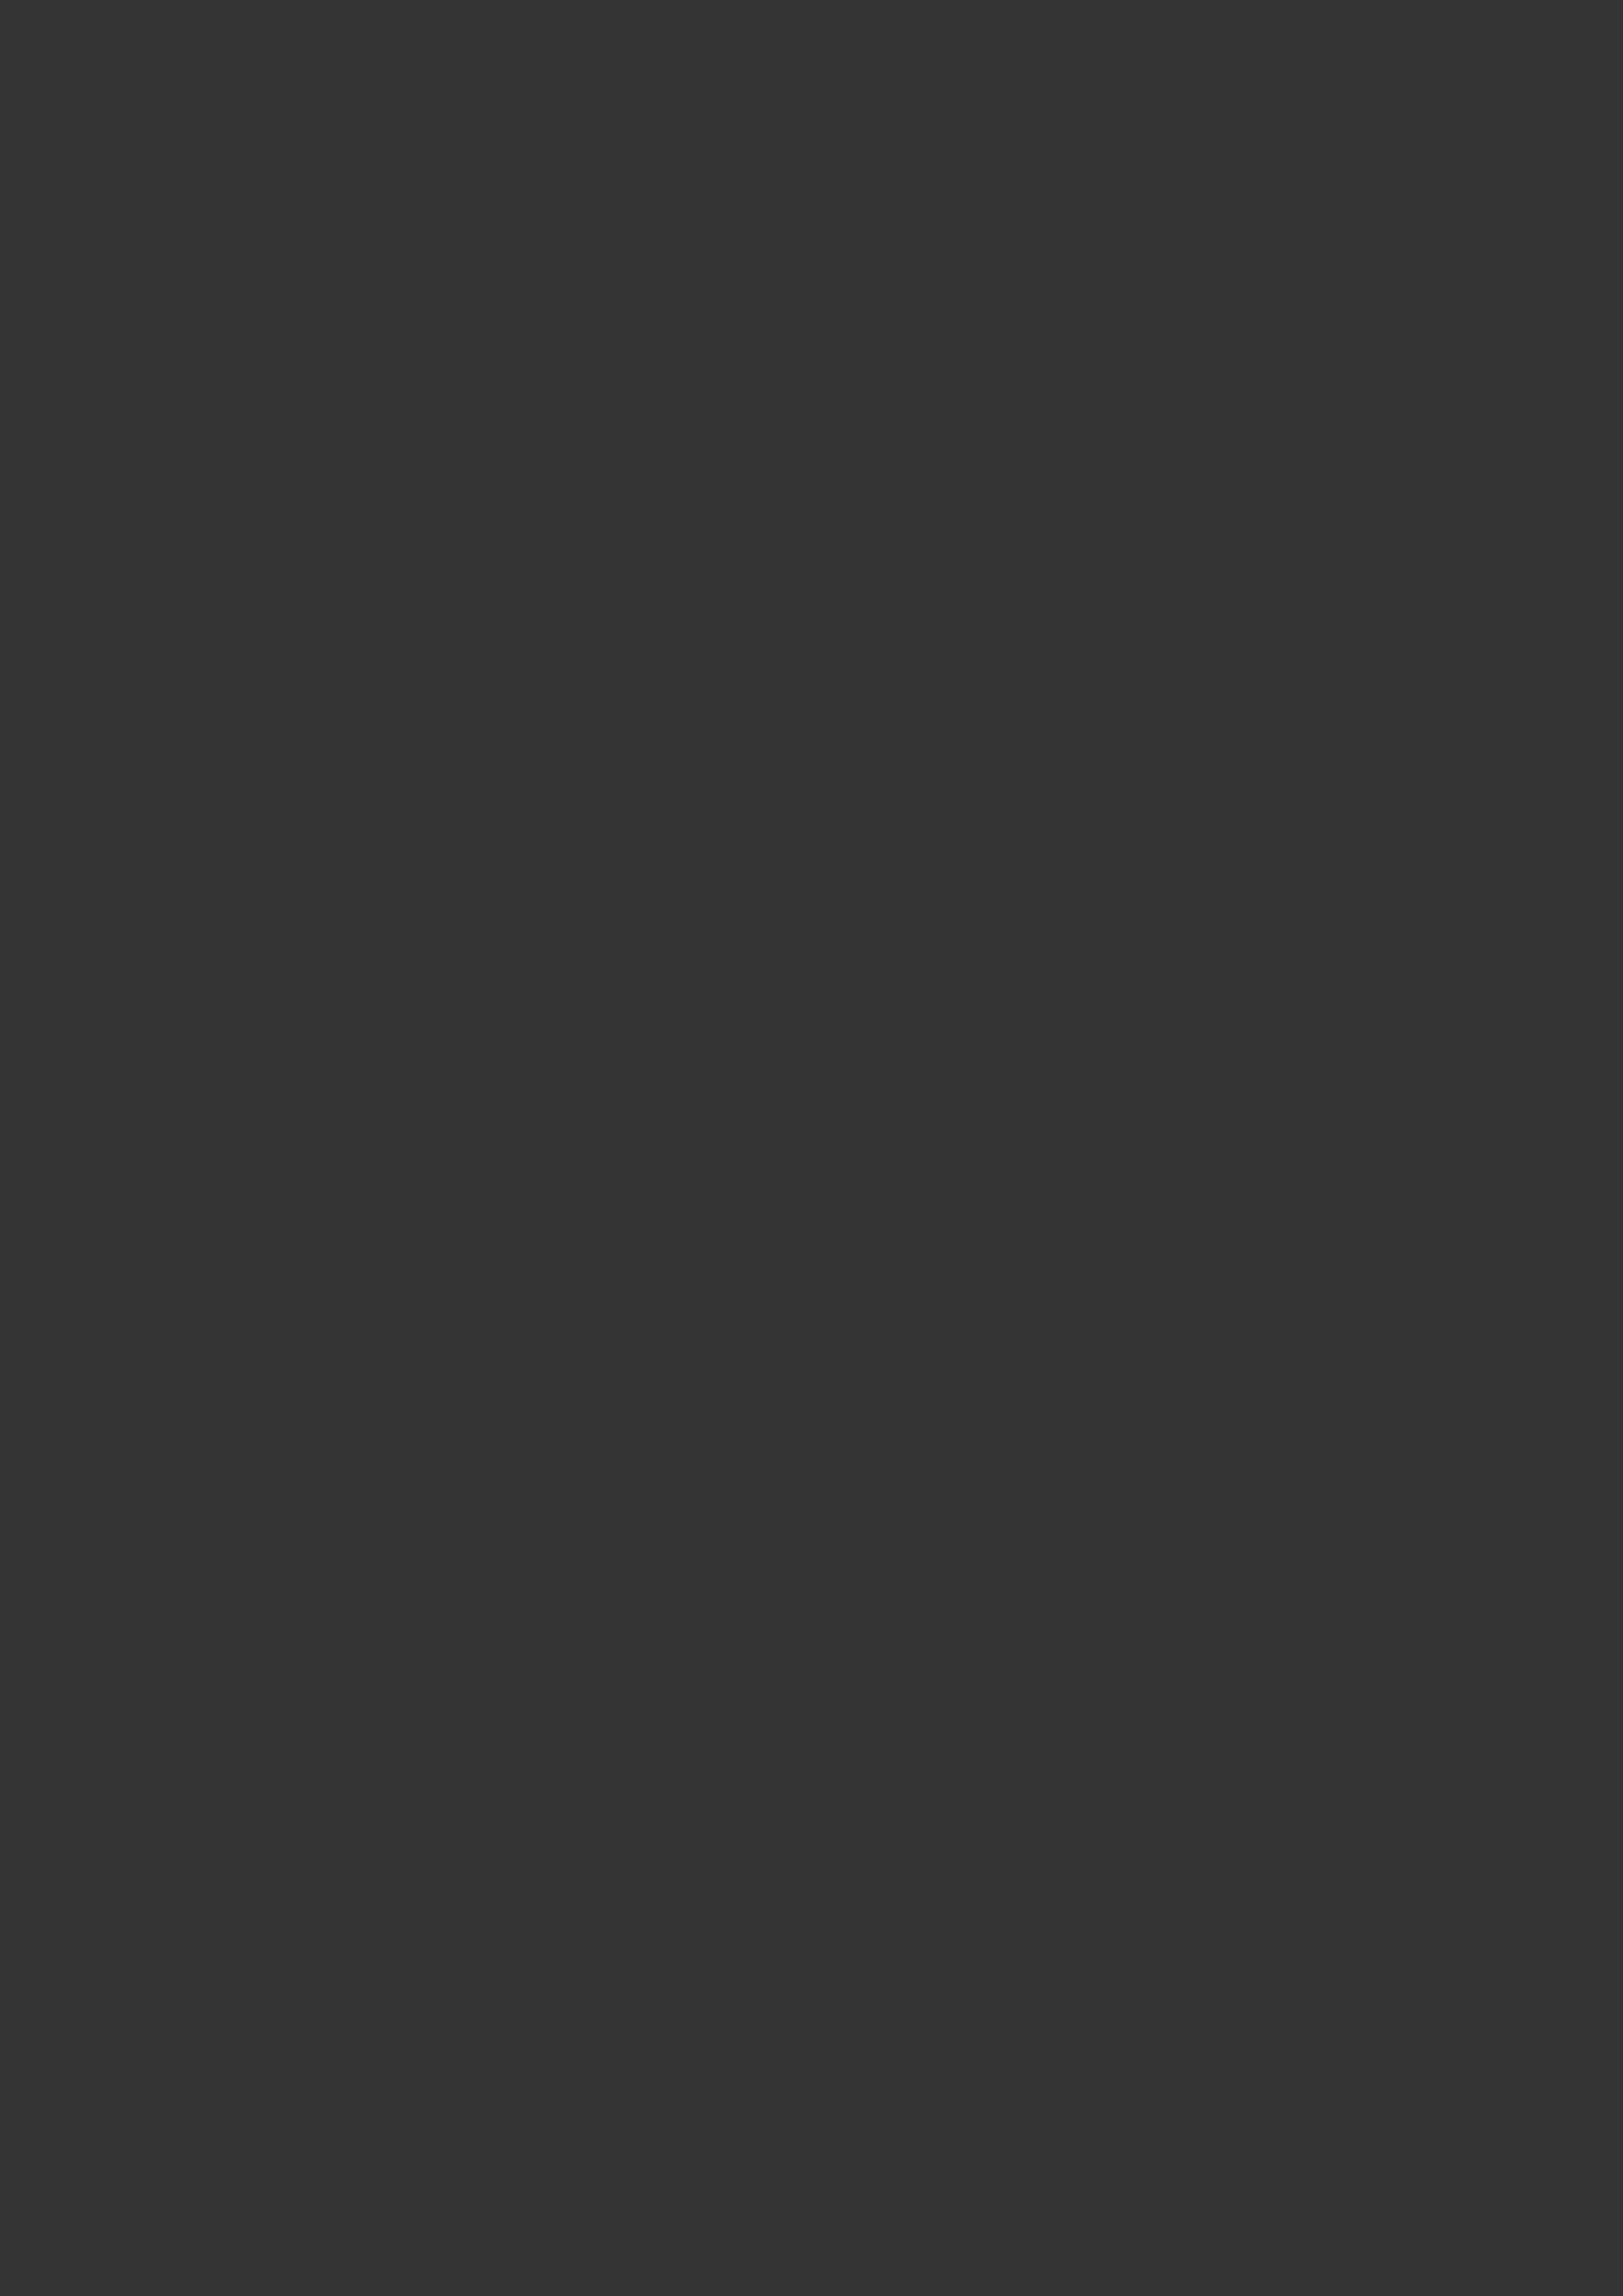 2480x3508 Jet Solid Color Background